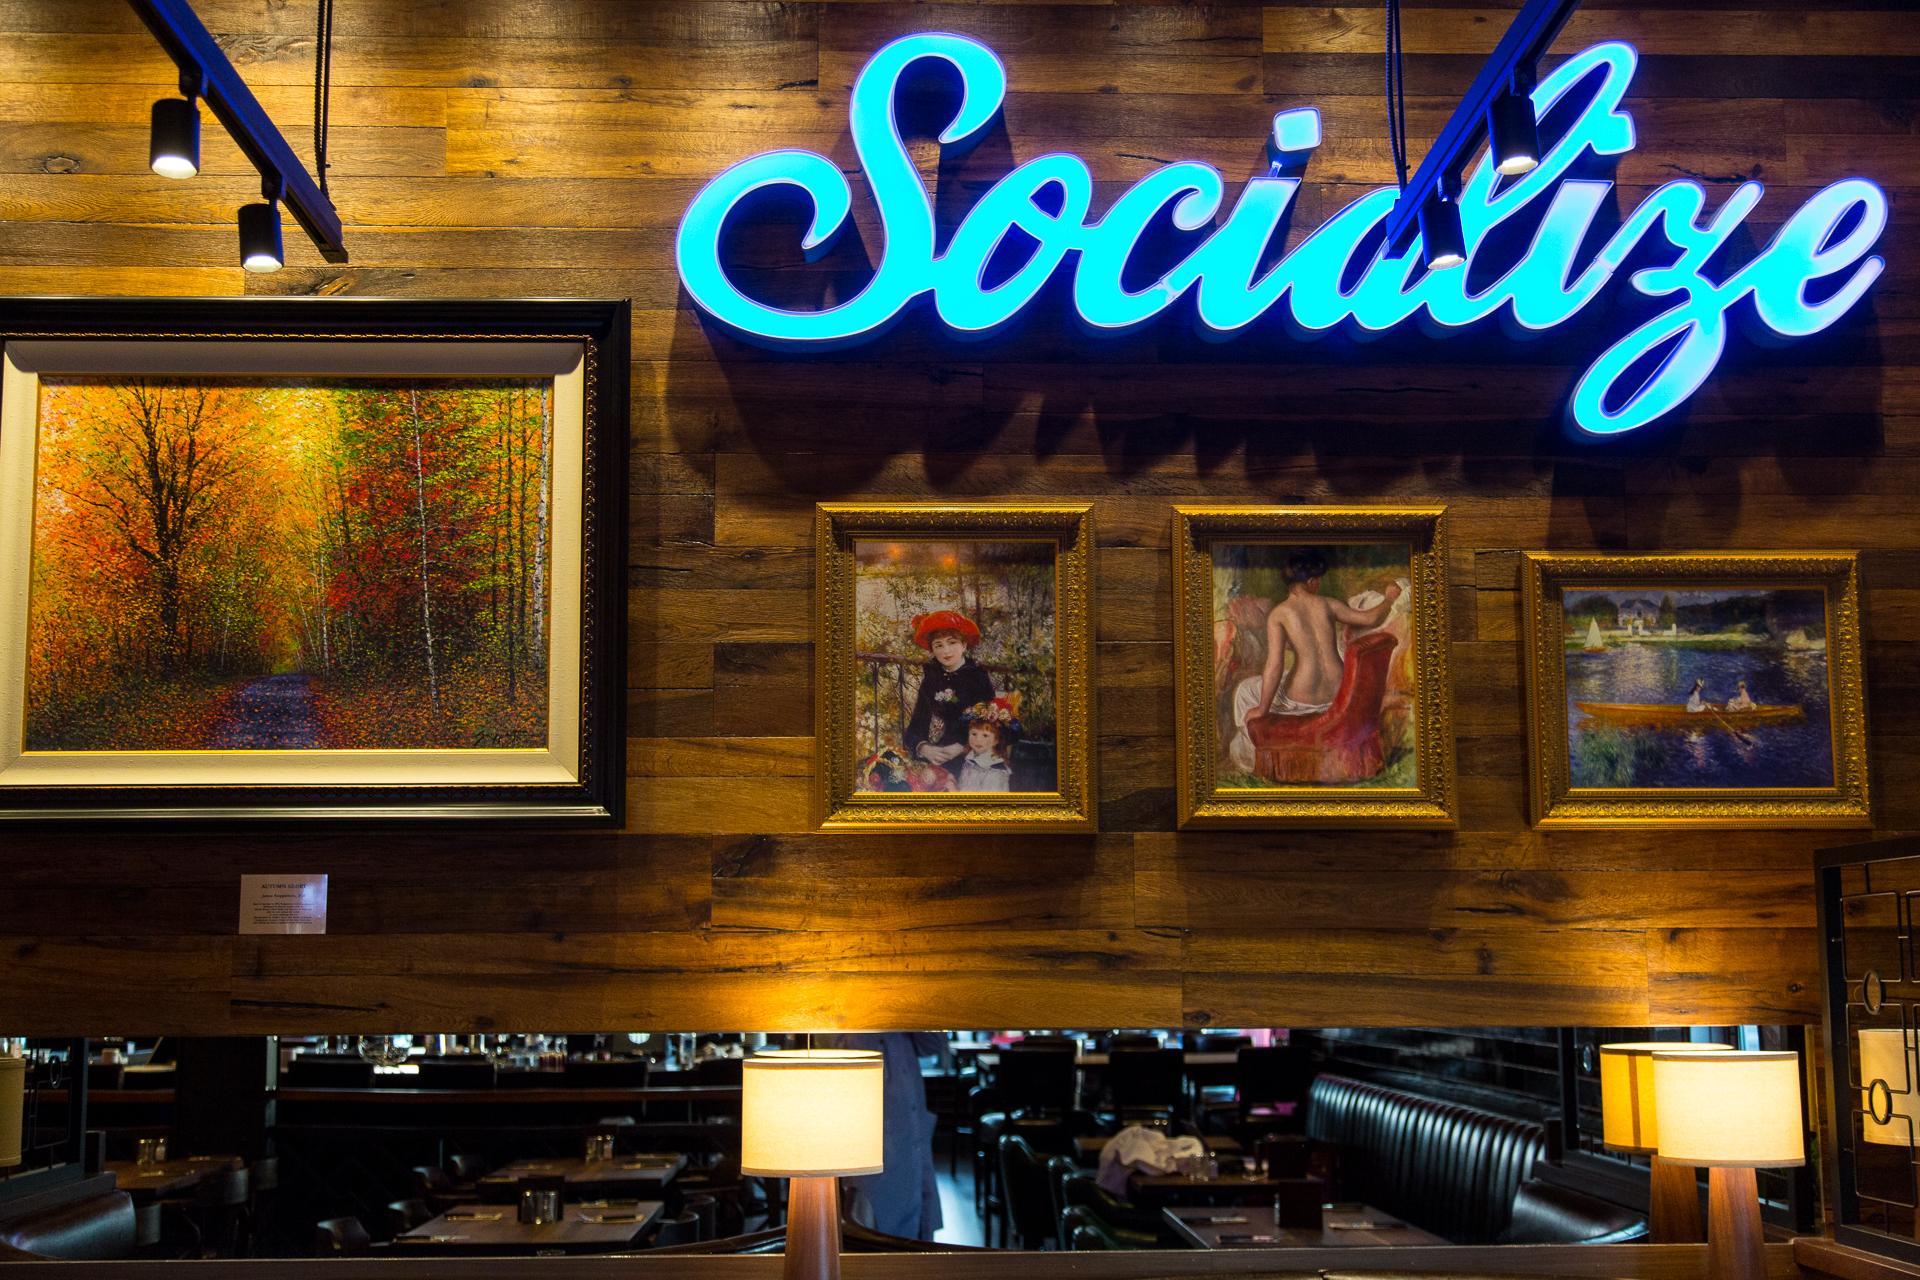 Chestermere Interior Socialize Sign.jpg